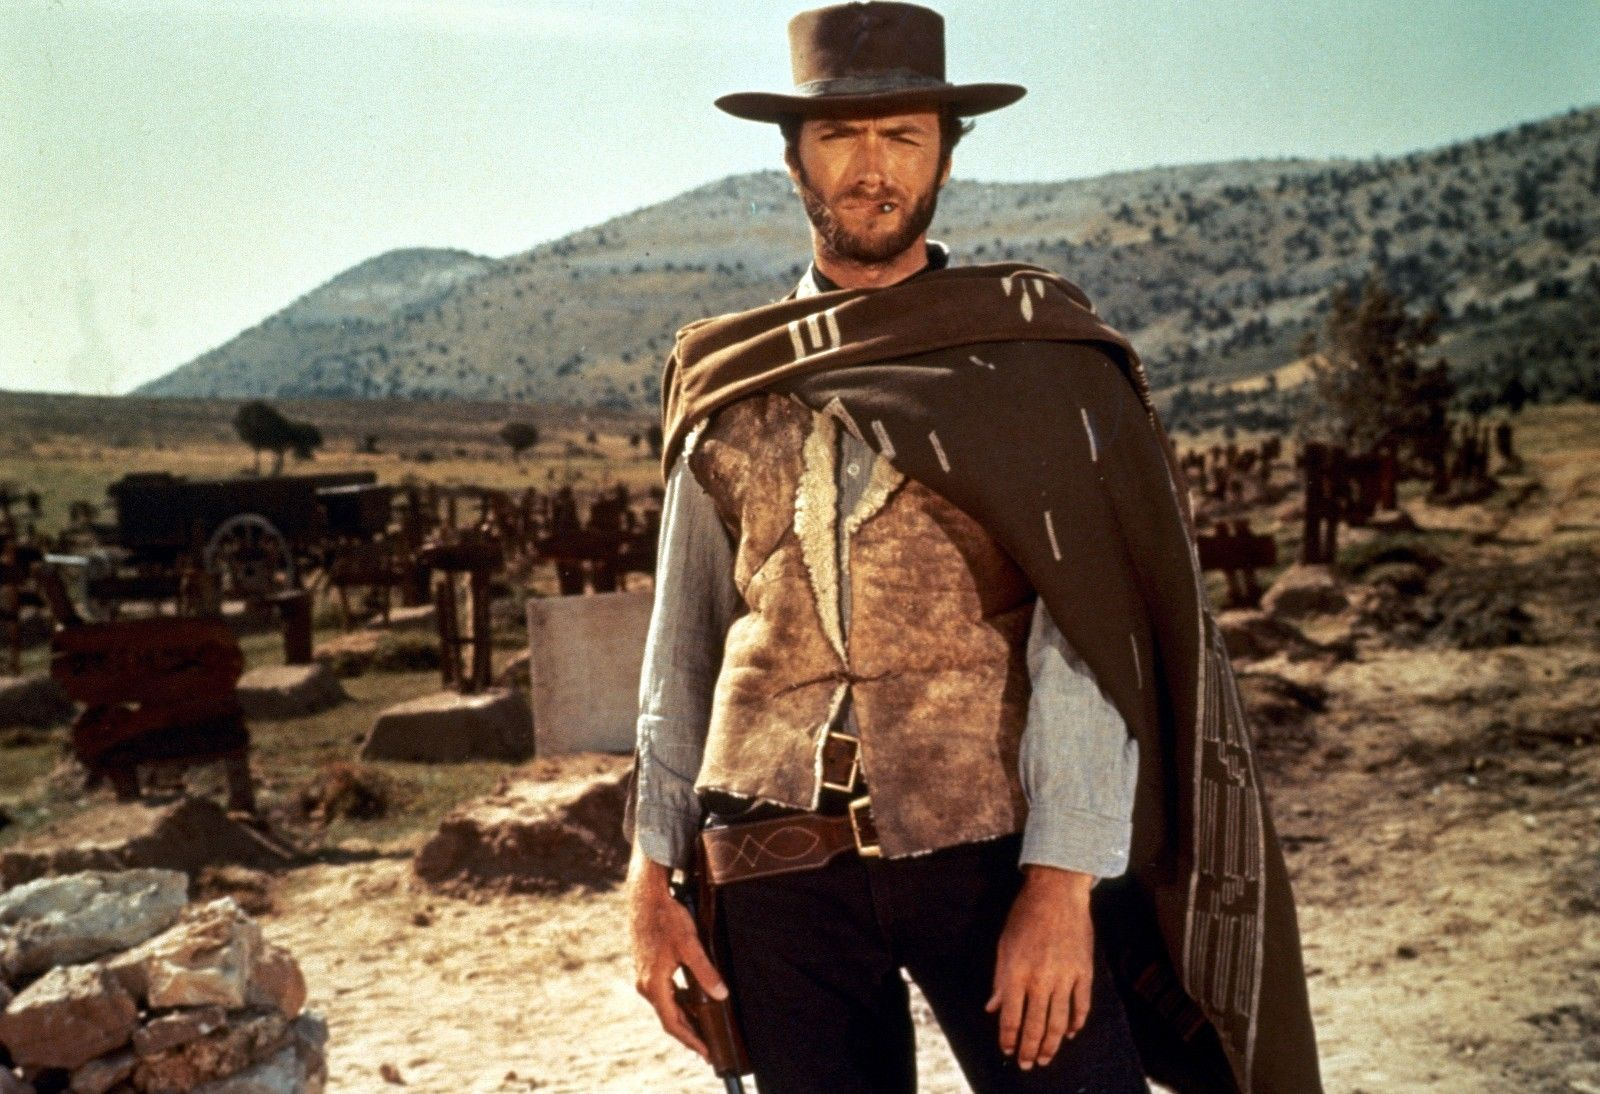 Clint-Eastwood-8X10.jpg